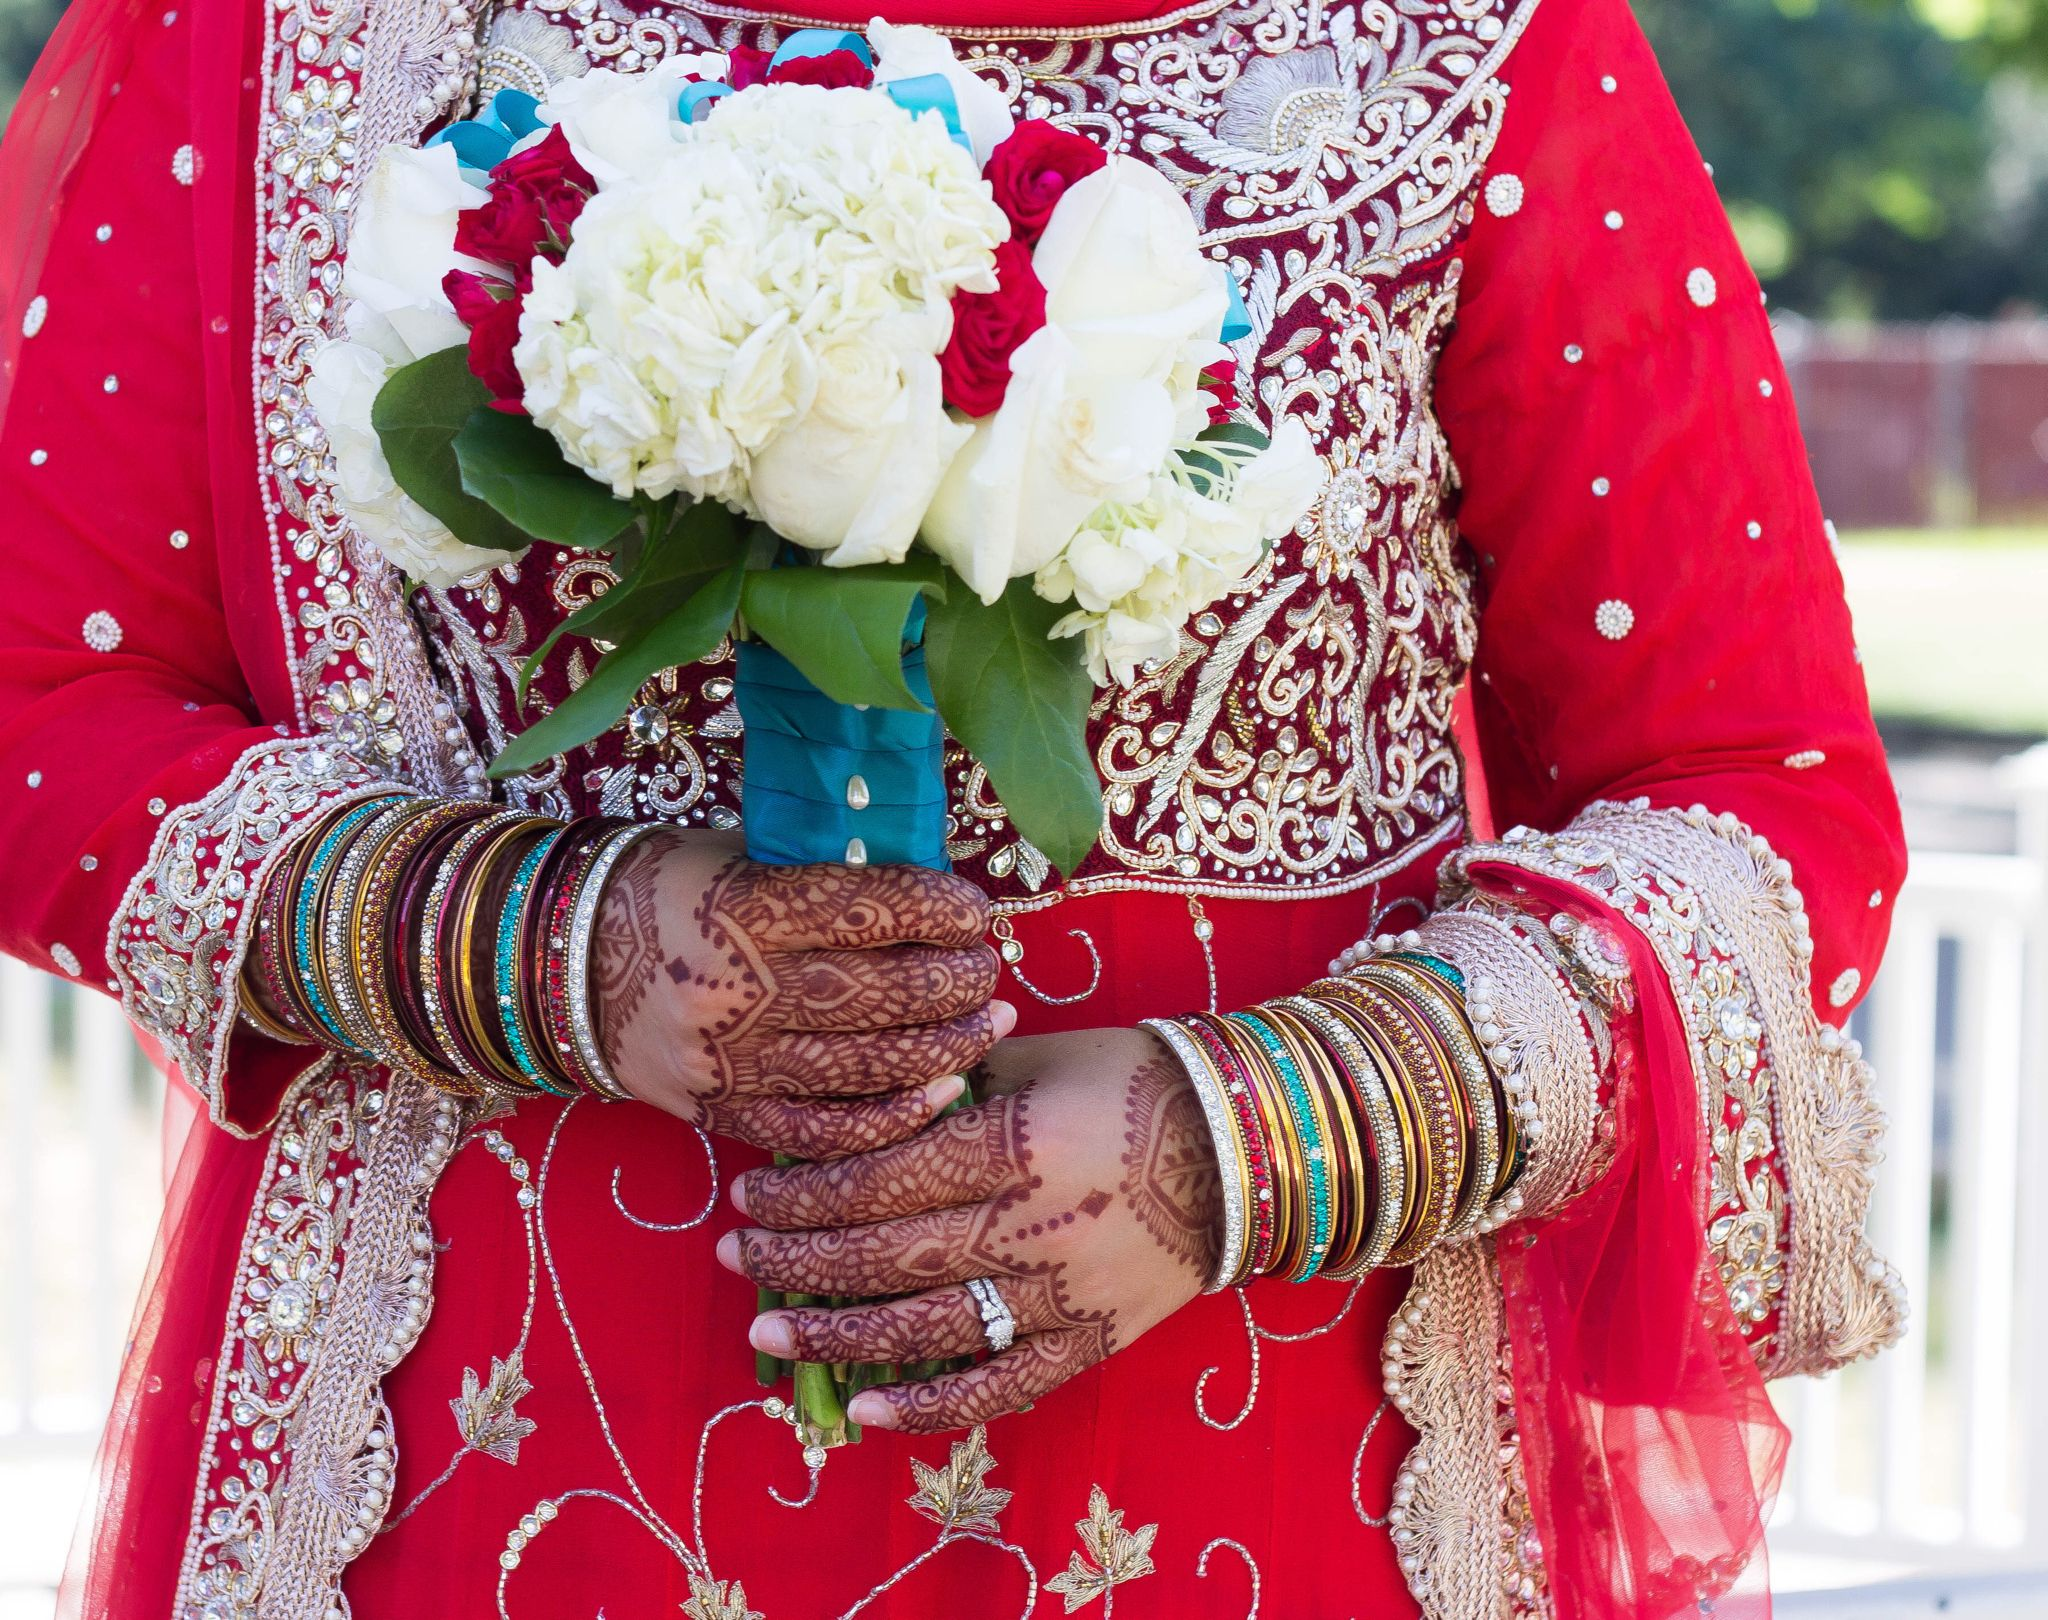 Indian Pakistani Fijian American bride with red lehenga